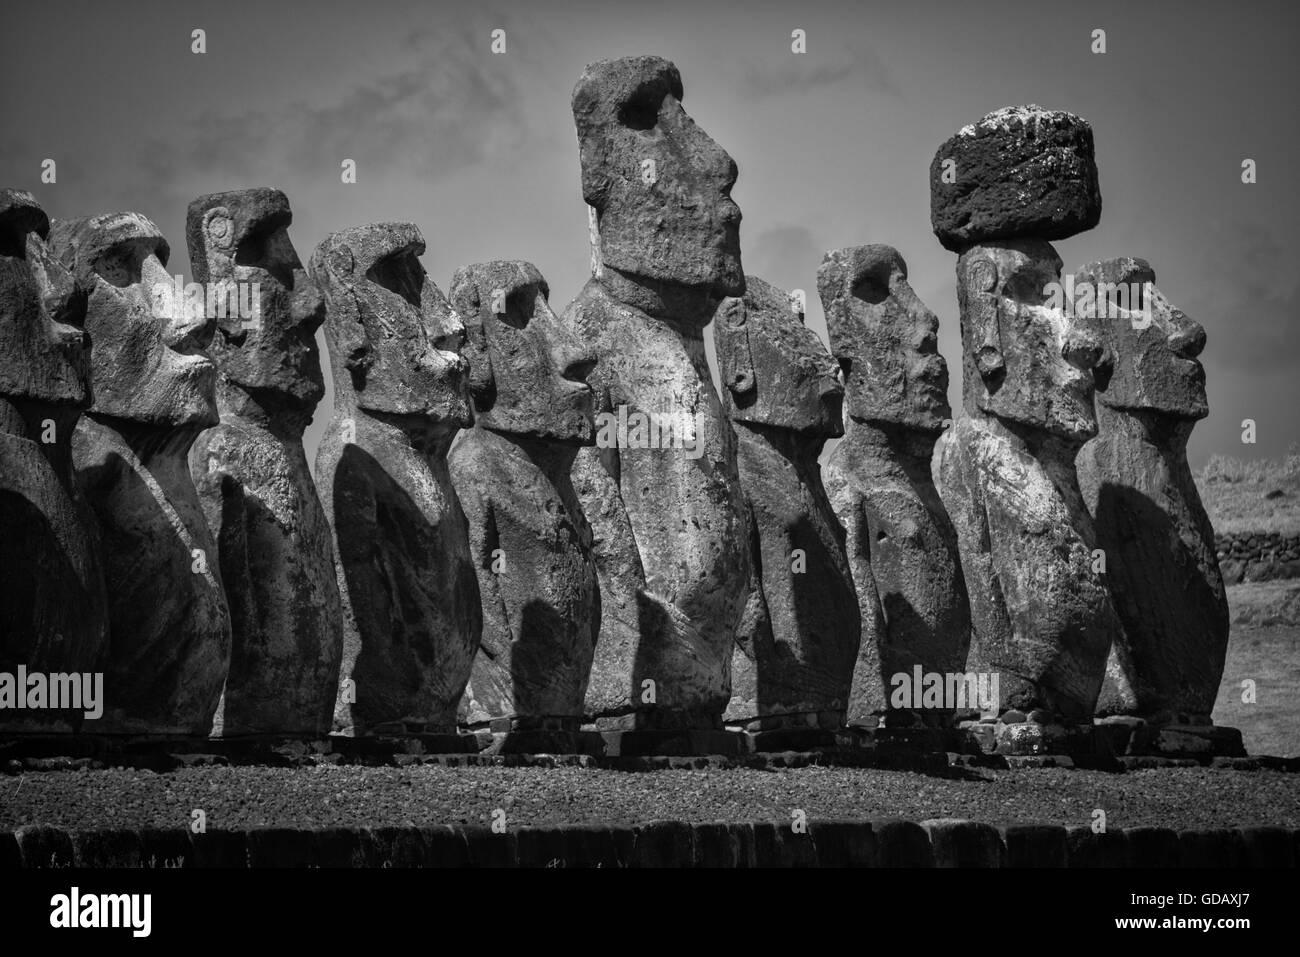 América del Sur, Chile, Isla de Pascua, Isla de Pasqua,pacífico sur,la UNESCO, Patrimonio Mundial, Foto de stock